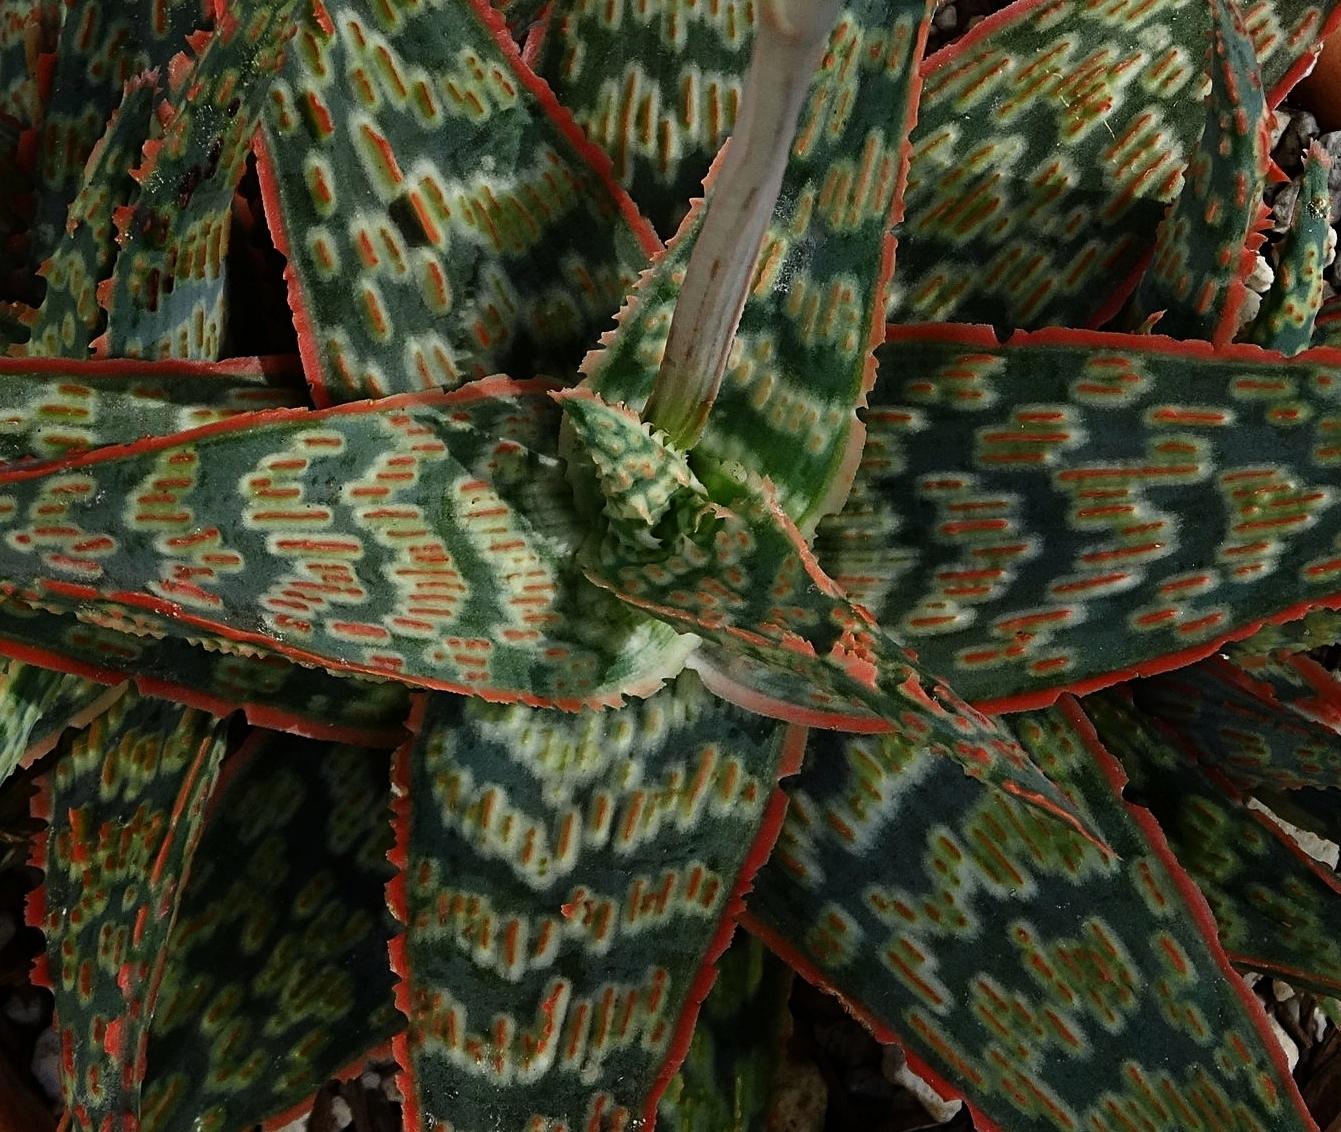 Flowering  Aloe  cv. 'Wrasse' (green form)